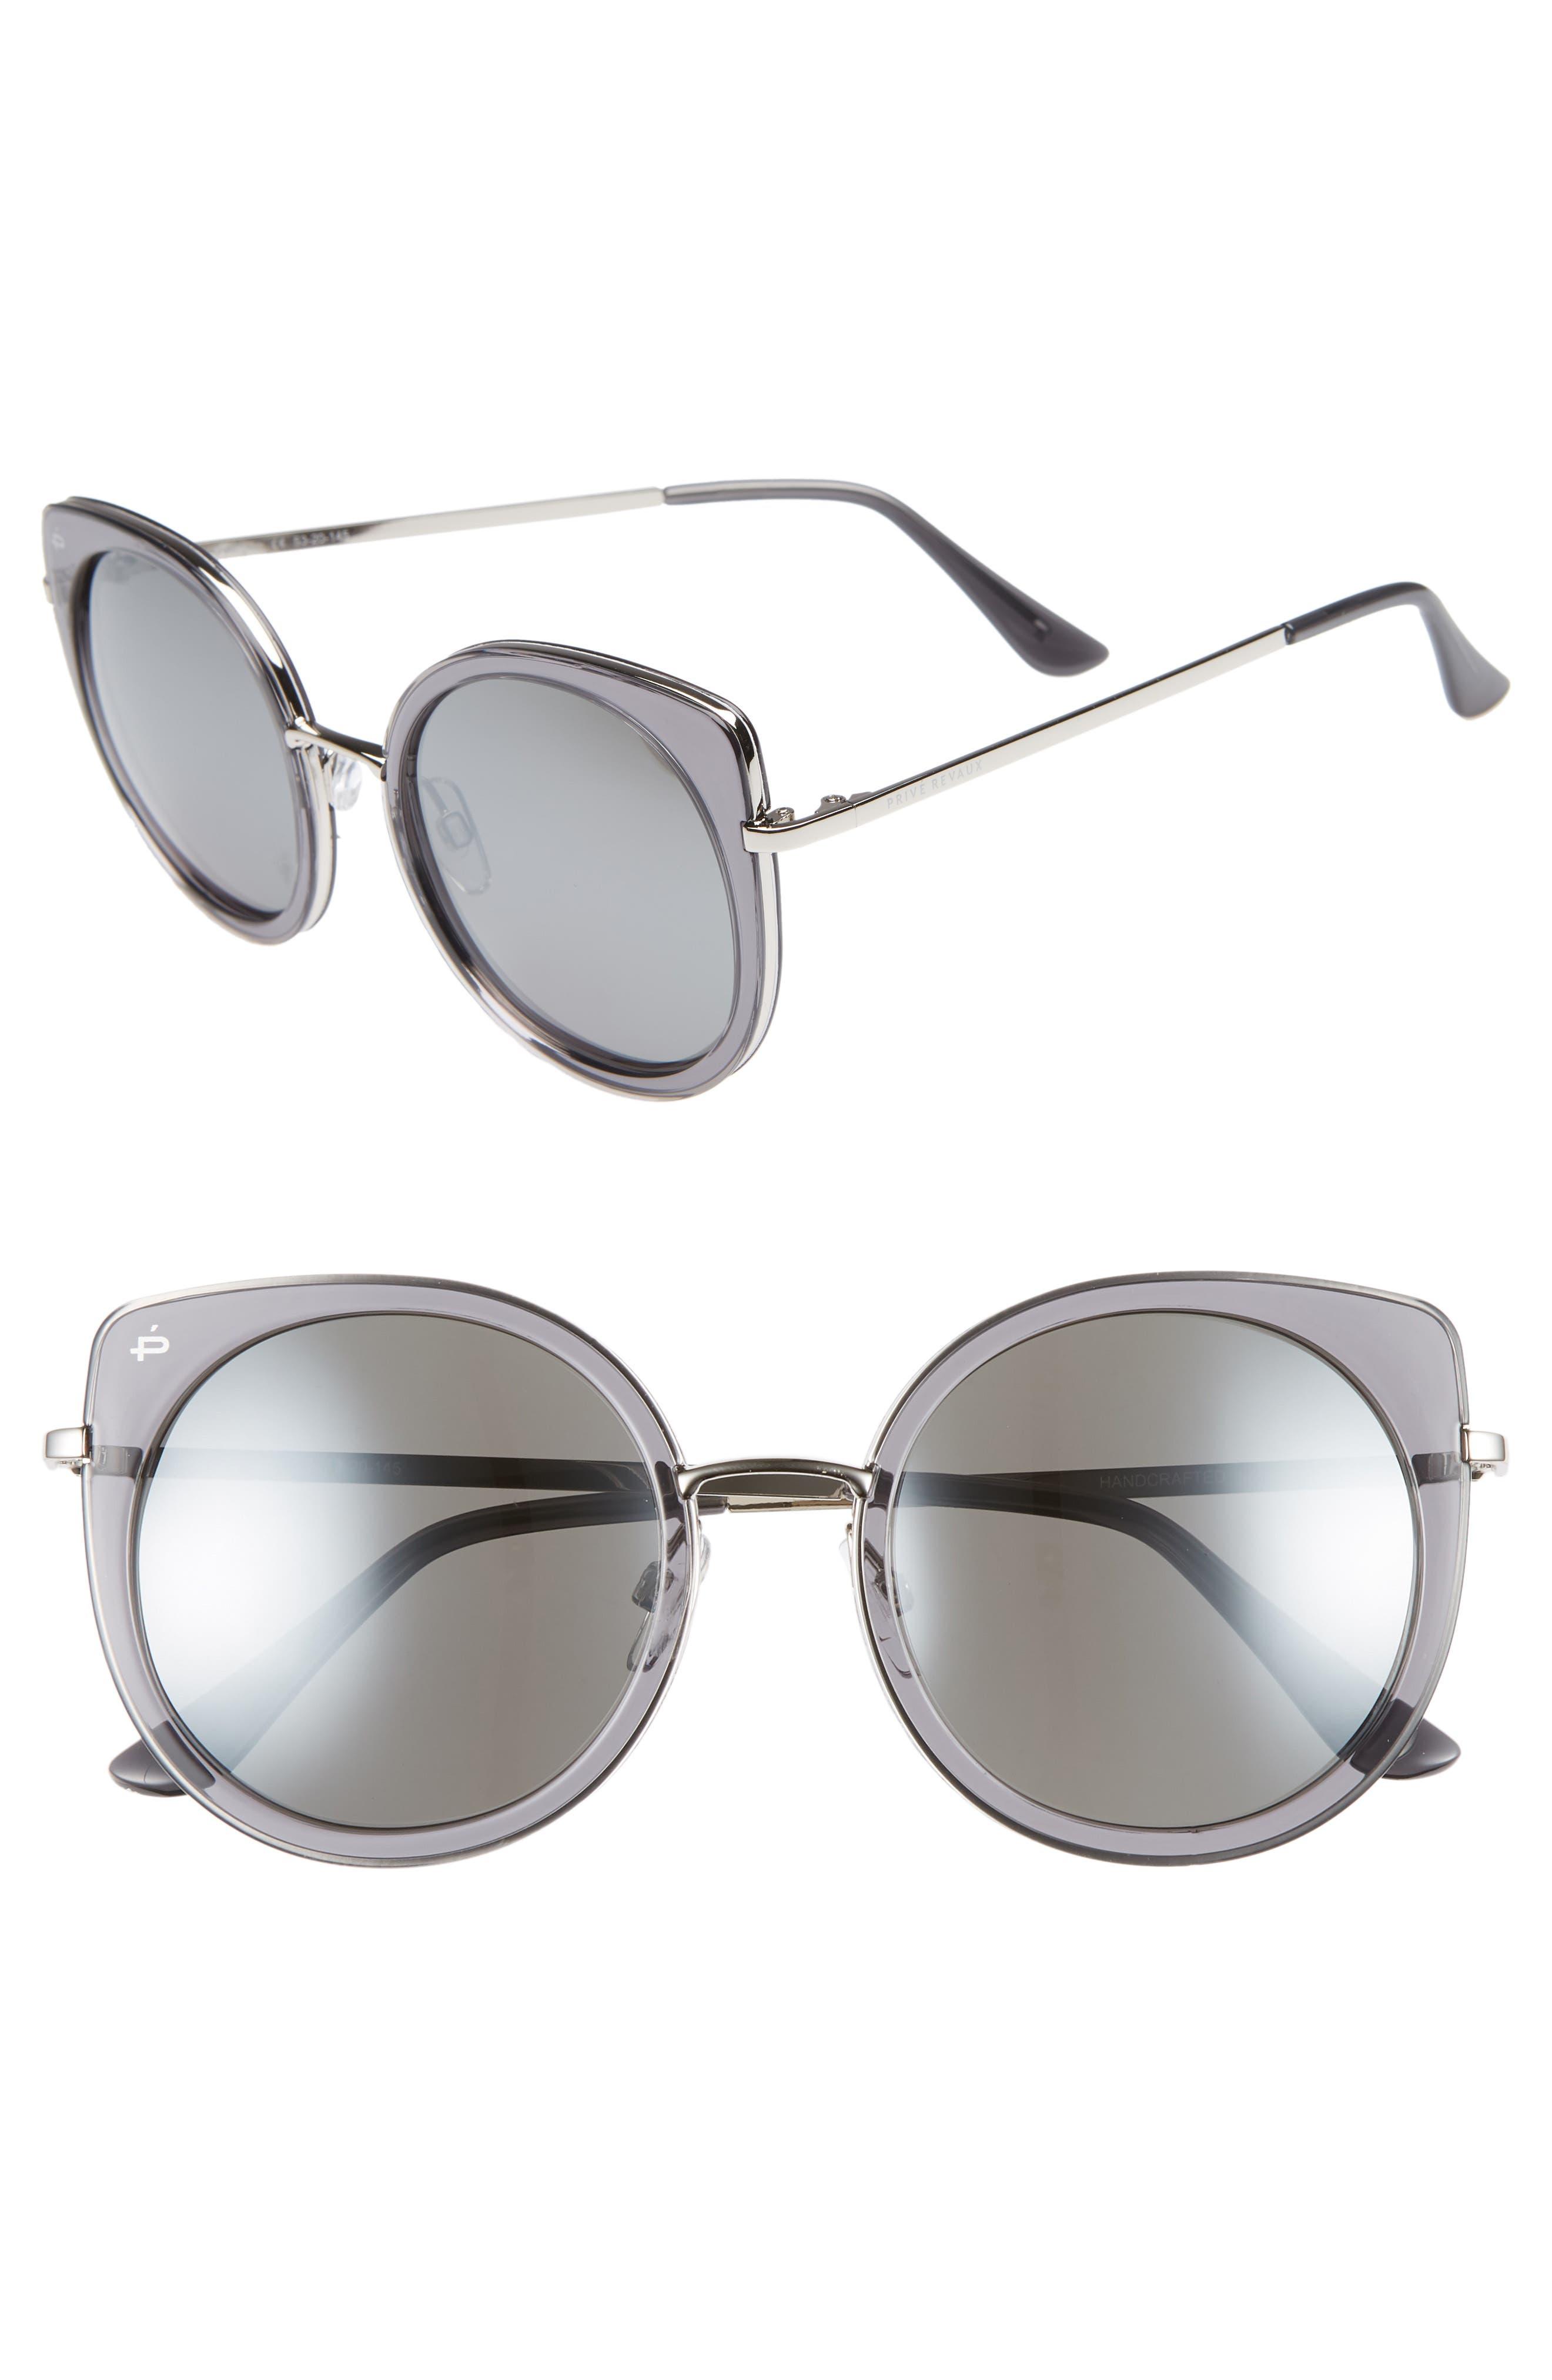 Privé Revaux The Georgian 53mm Sunglasses,                             Main thumbnail 1, color,                             CRYSTAL SMOKE